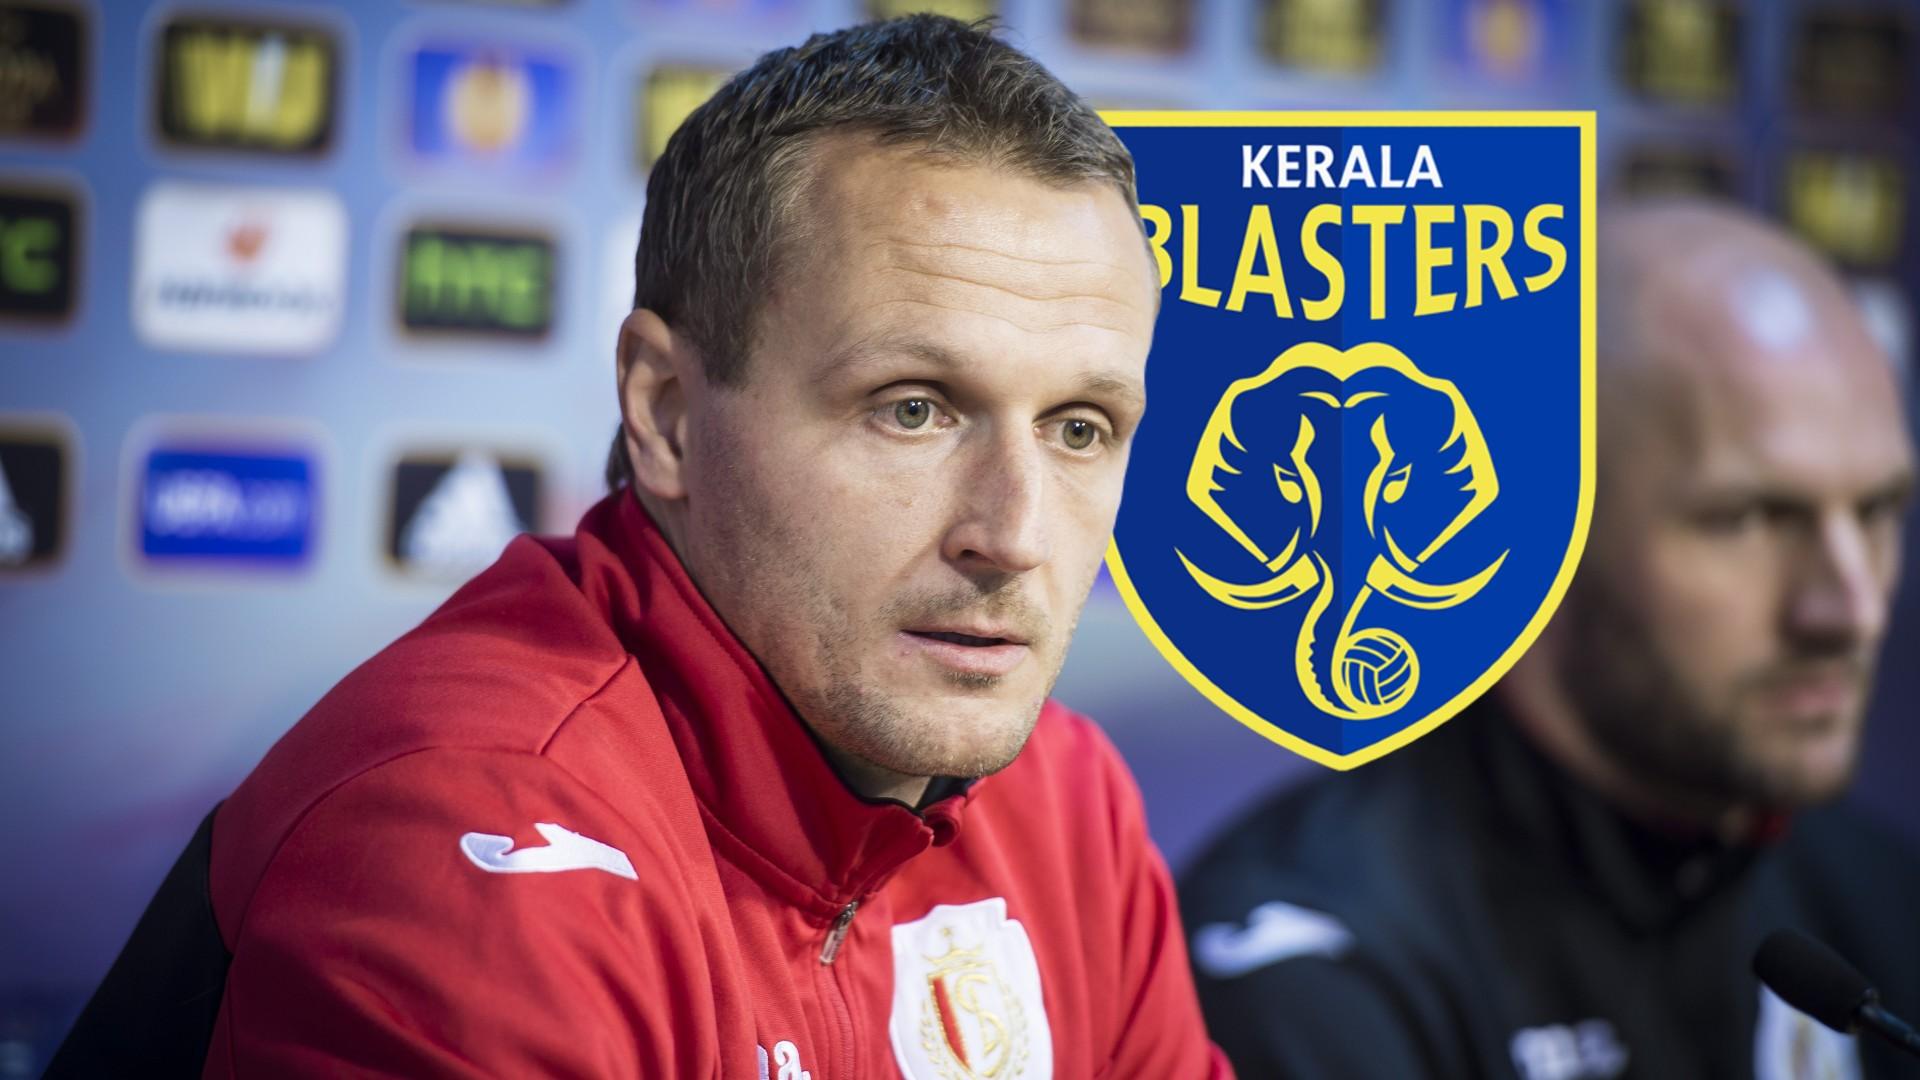 ISL: Kerala Blasters set to sign Ivan Vukomanovic as head coach